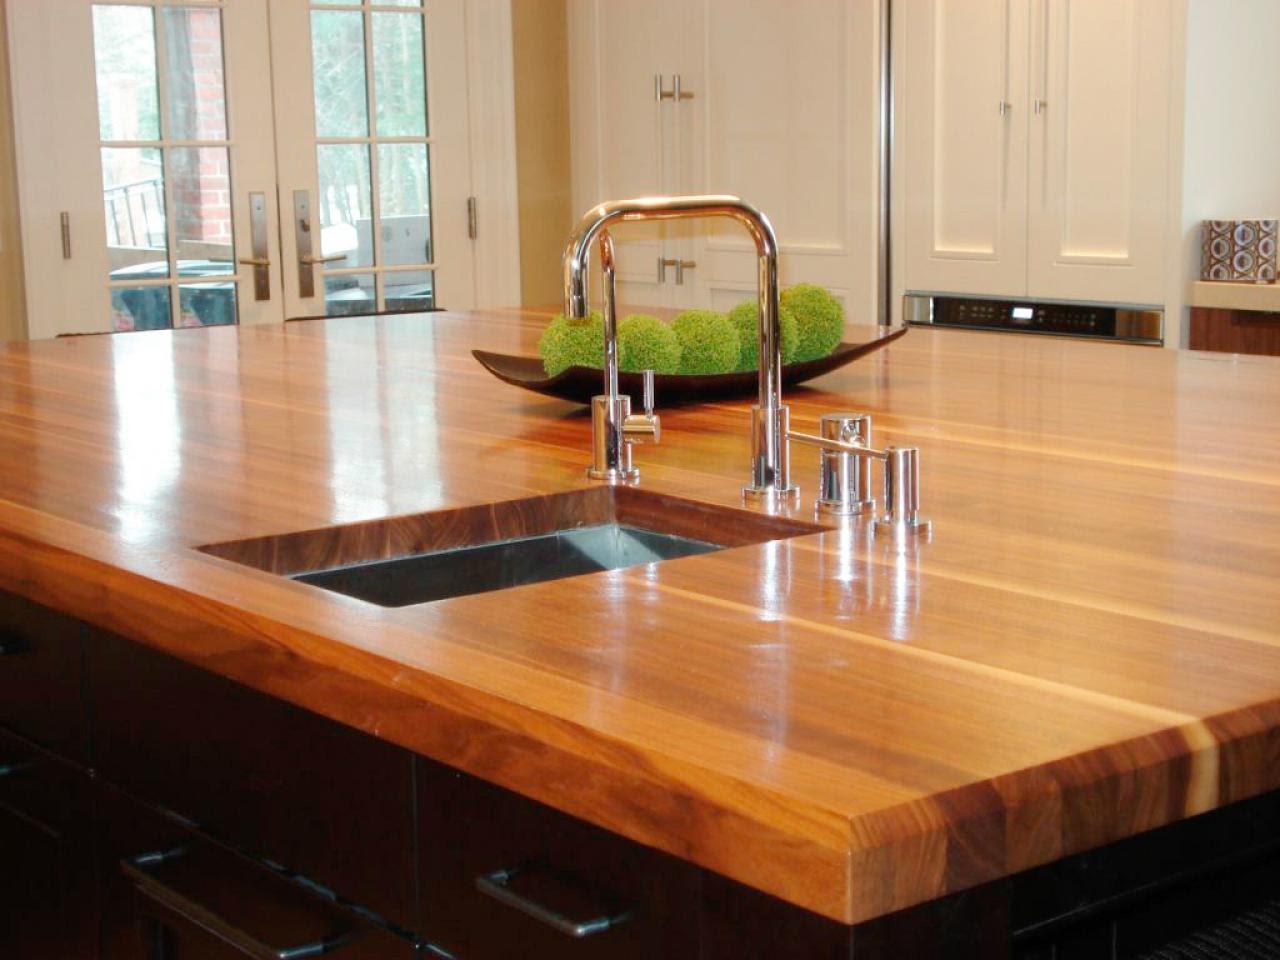 Resurfacing Kitchen Countertops_s4x3